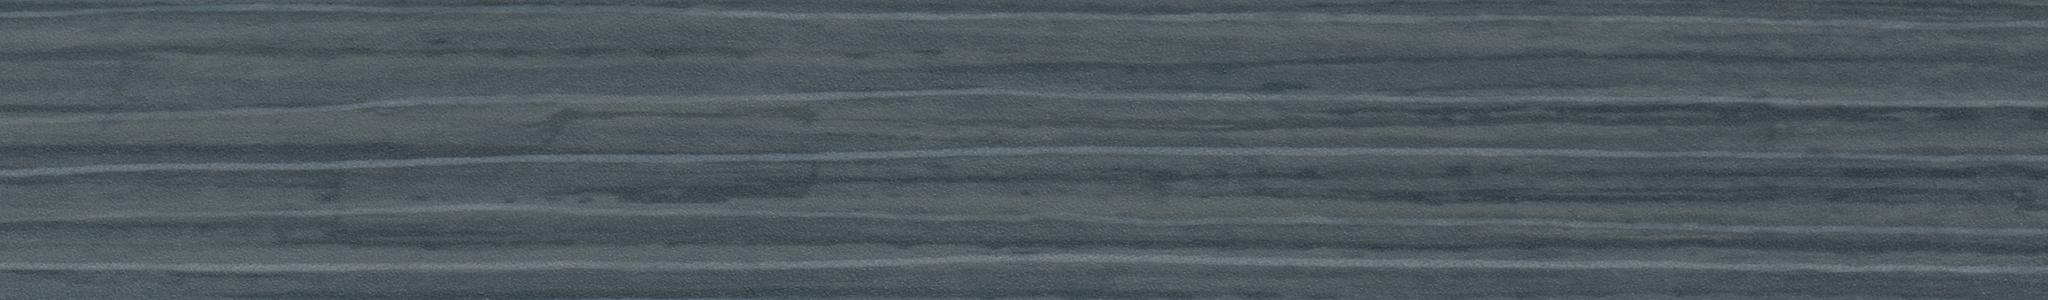 HD 29101 ABS Kante Schwarz Banian glatt